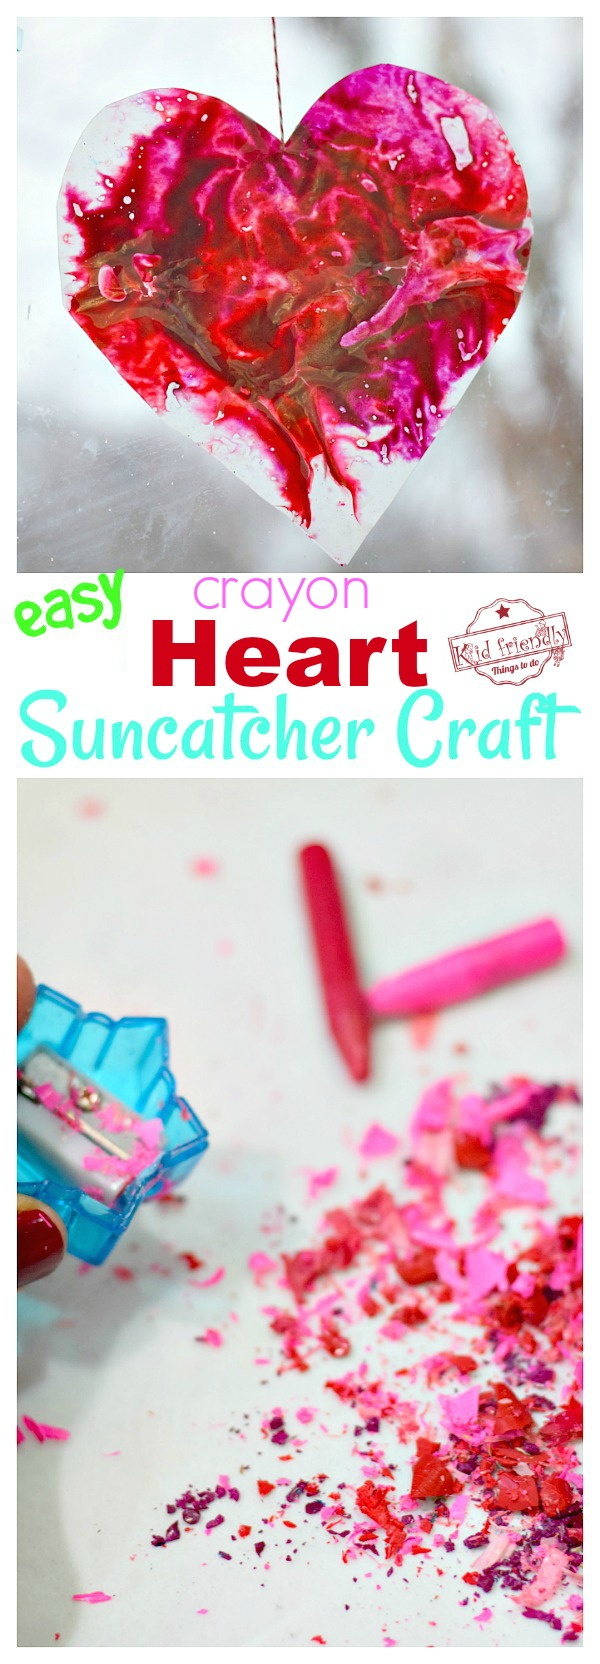 Sun catcher craft ideas